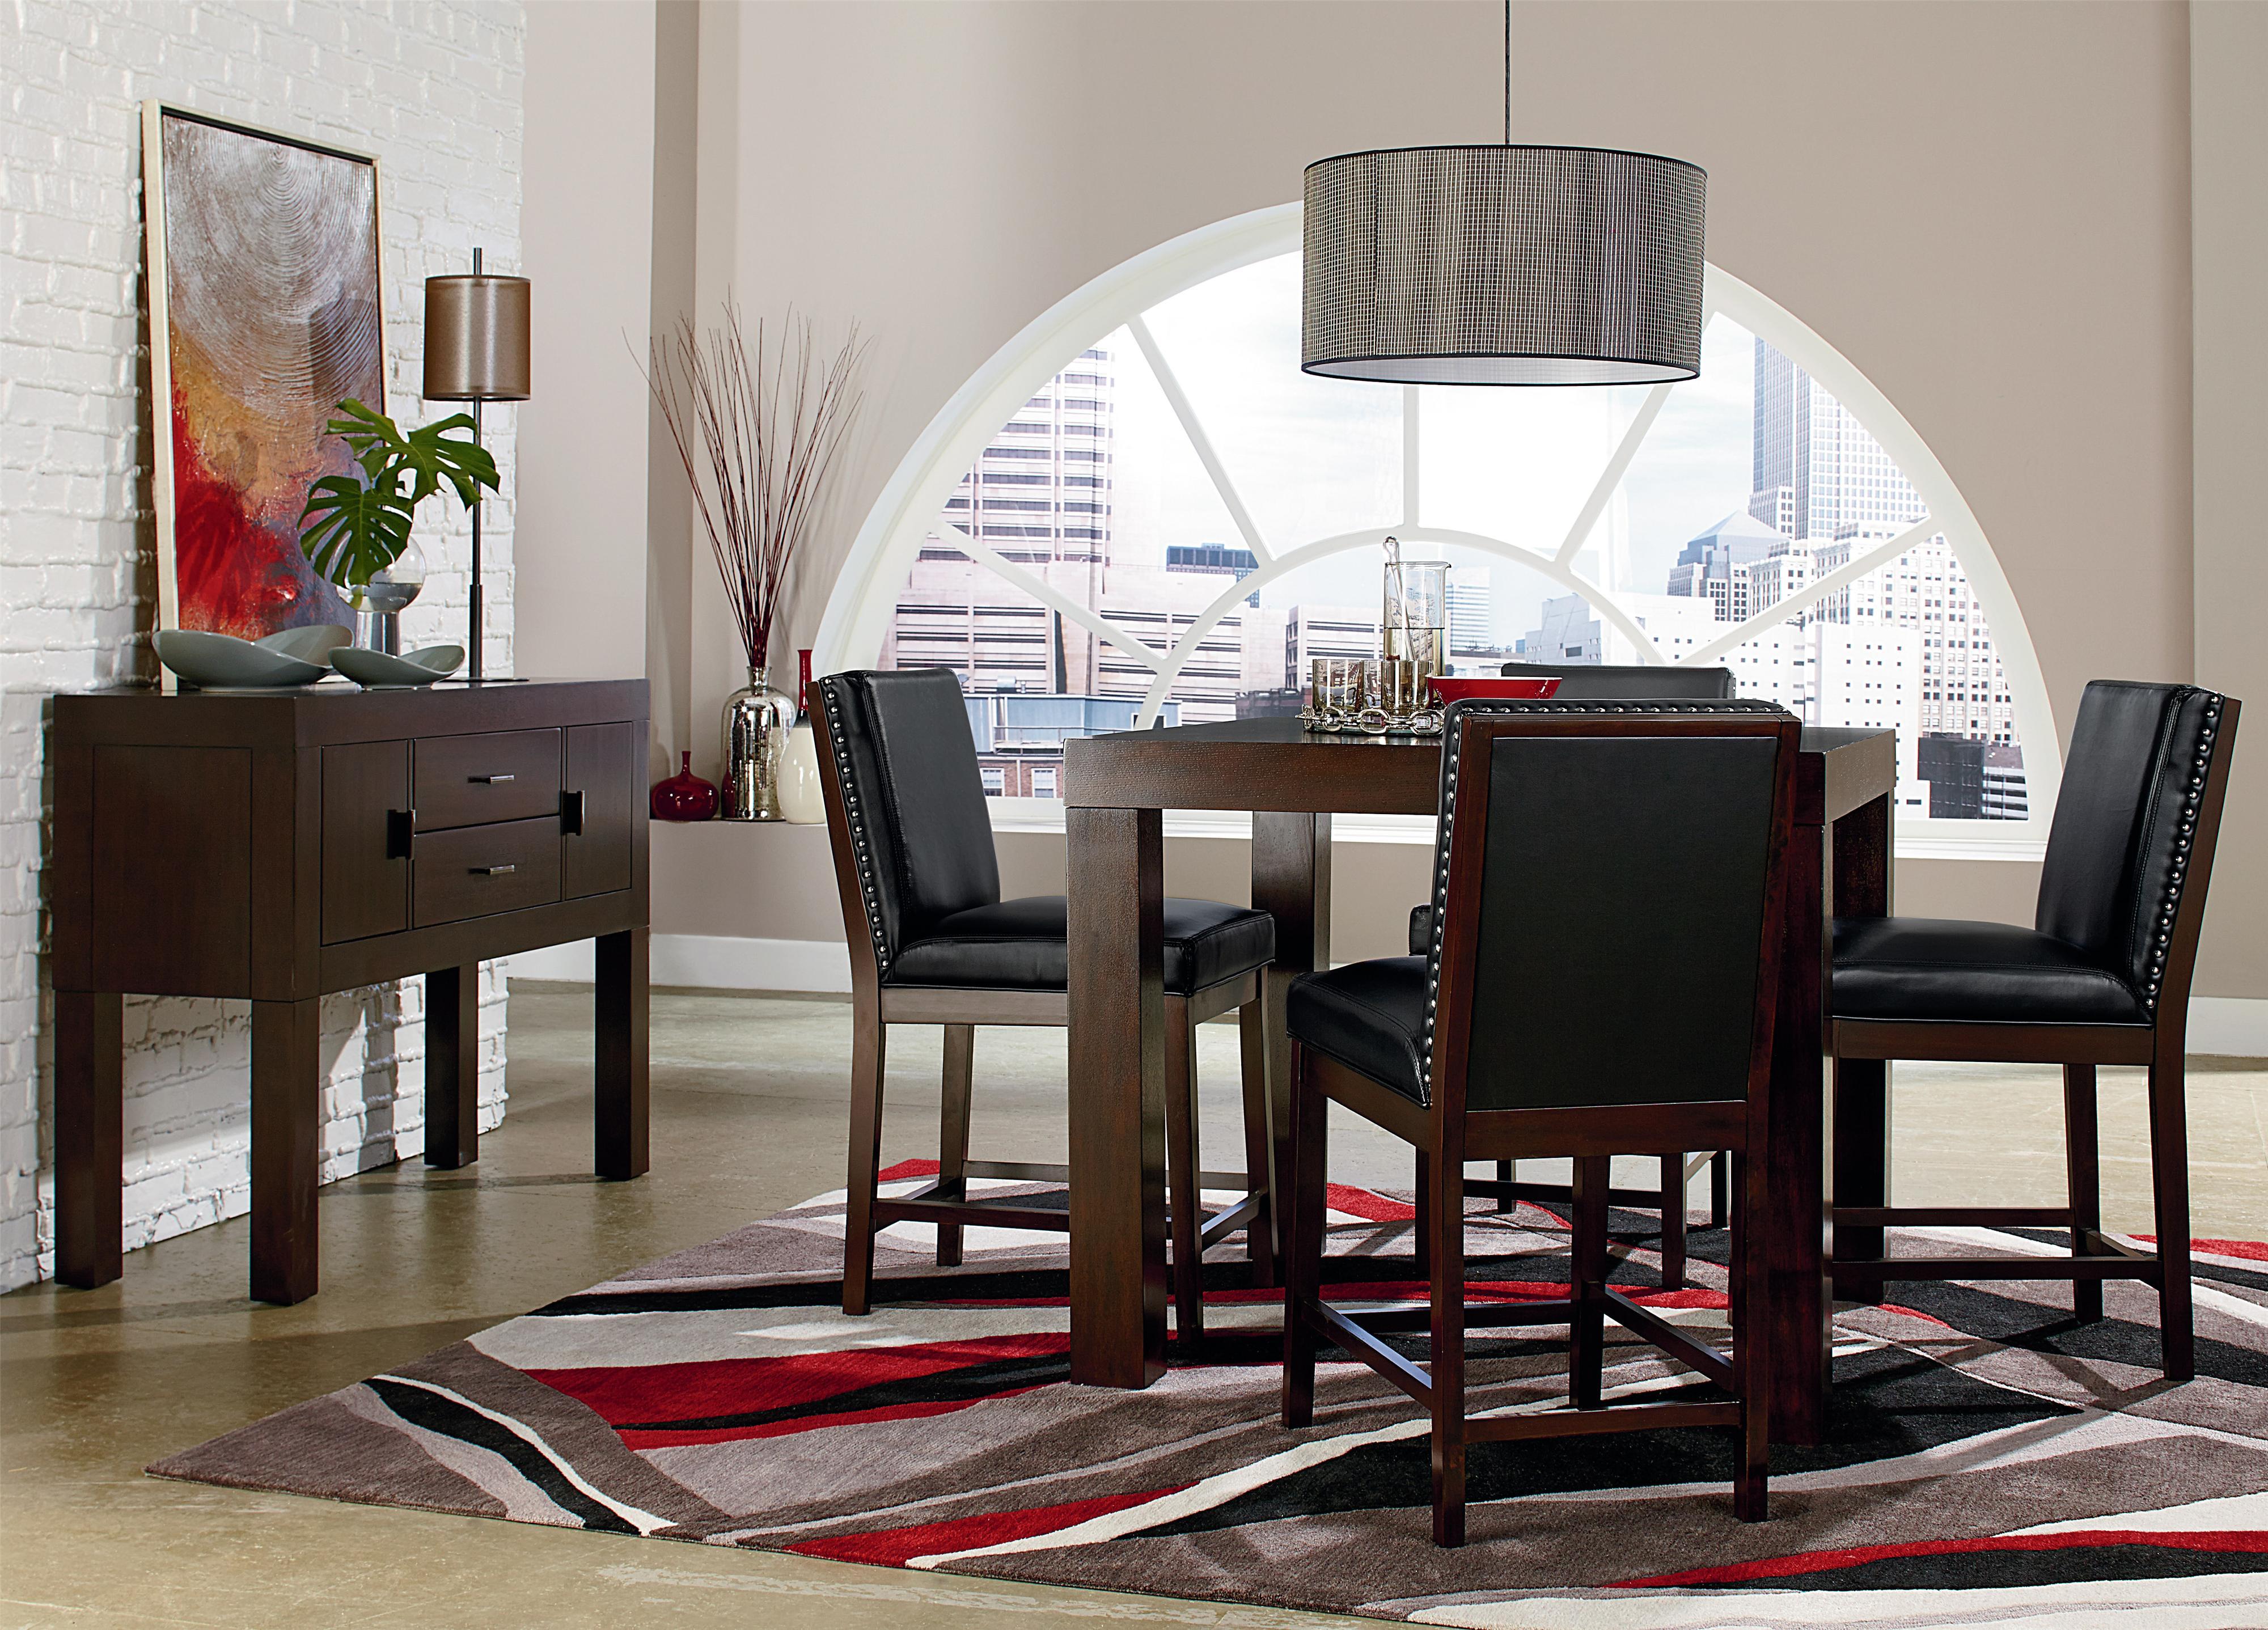 Standard Furniture Couture Elegance Dining Room Group   Item Number: 10560  C Dining Room Group